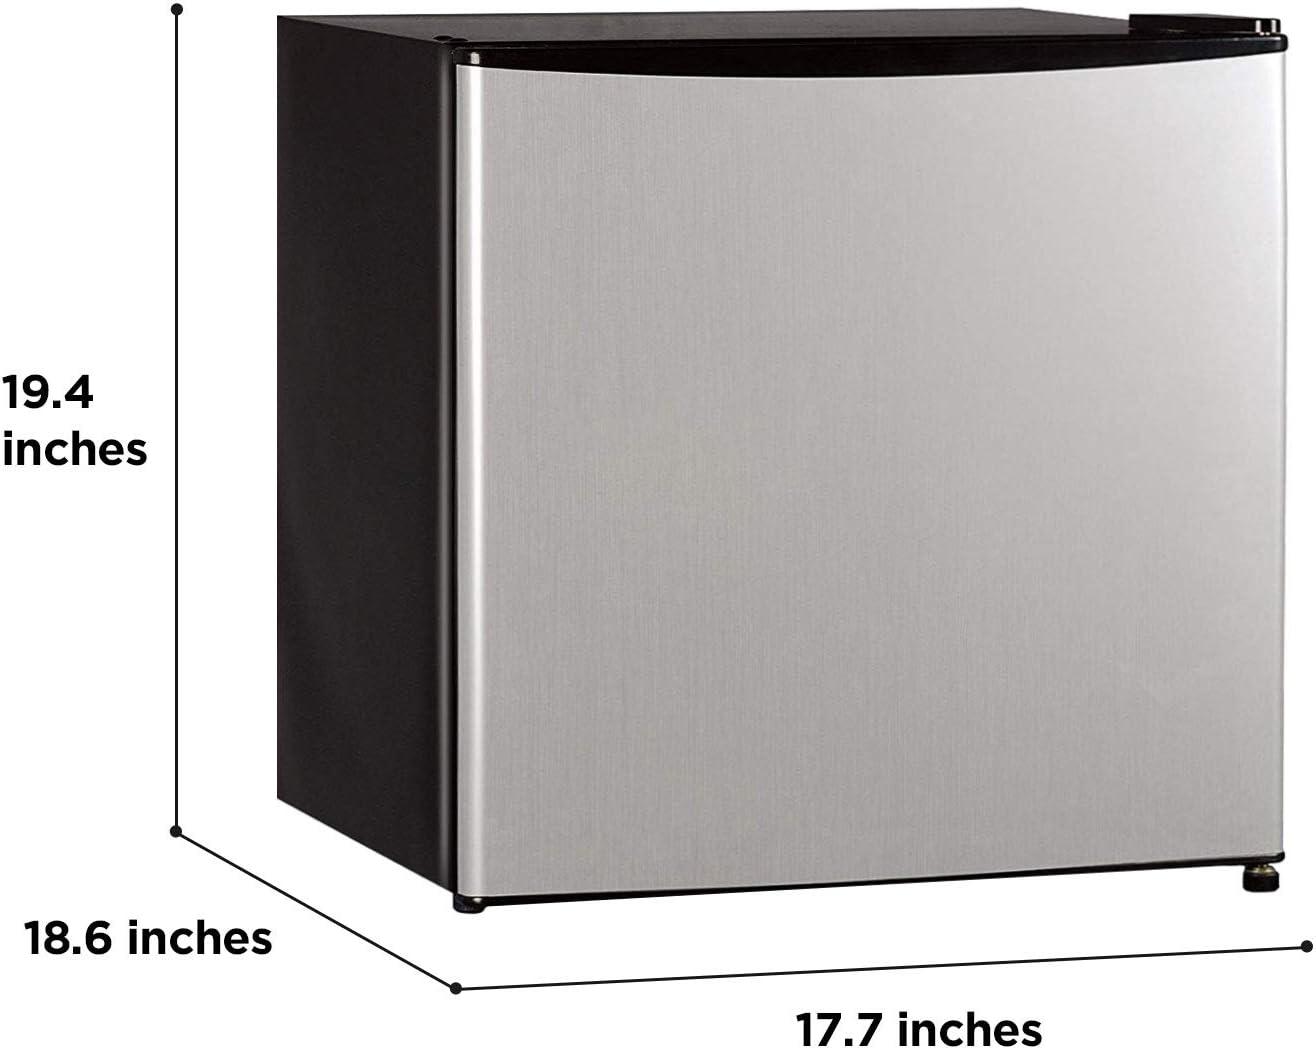 Midea Compact Refrigerator